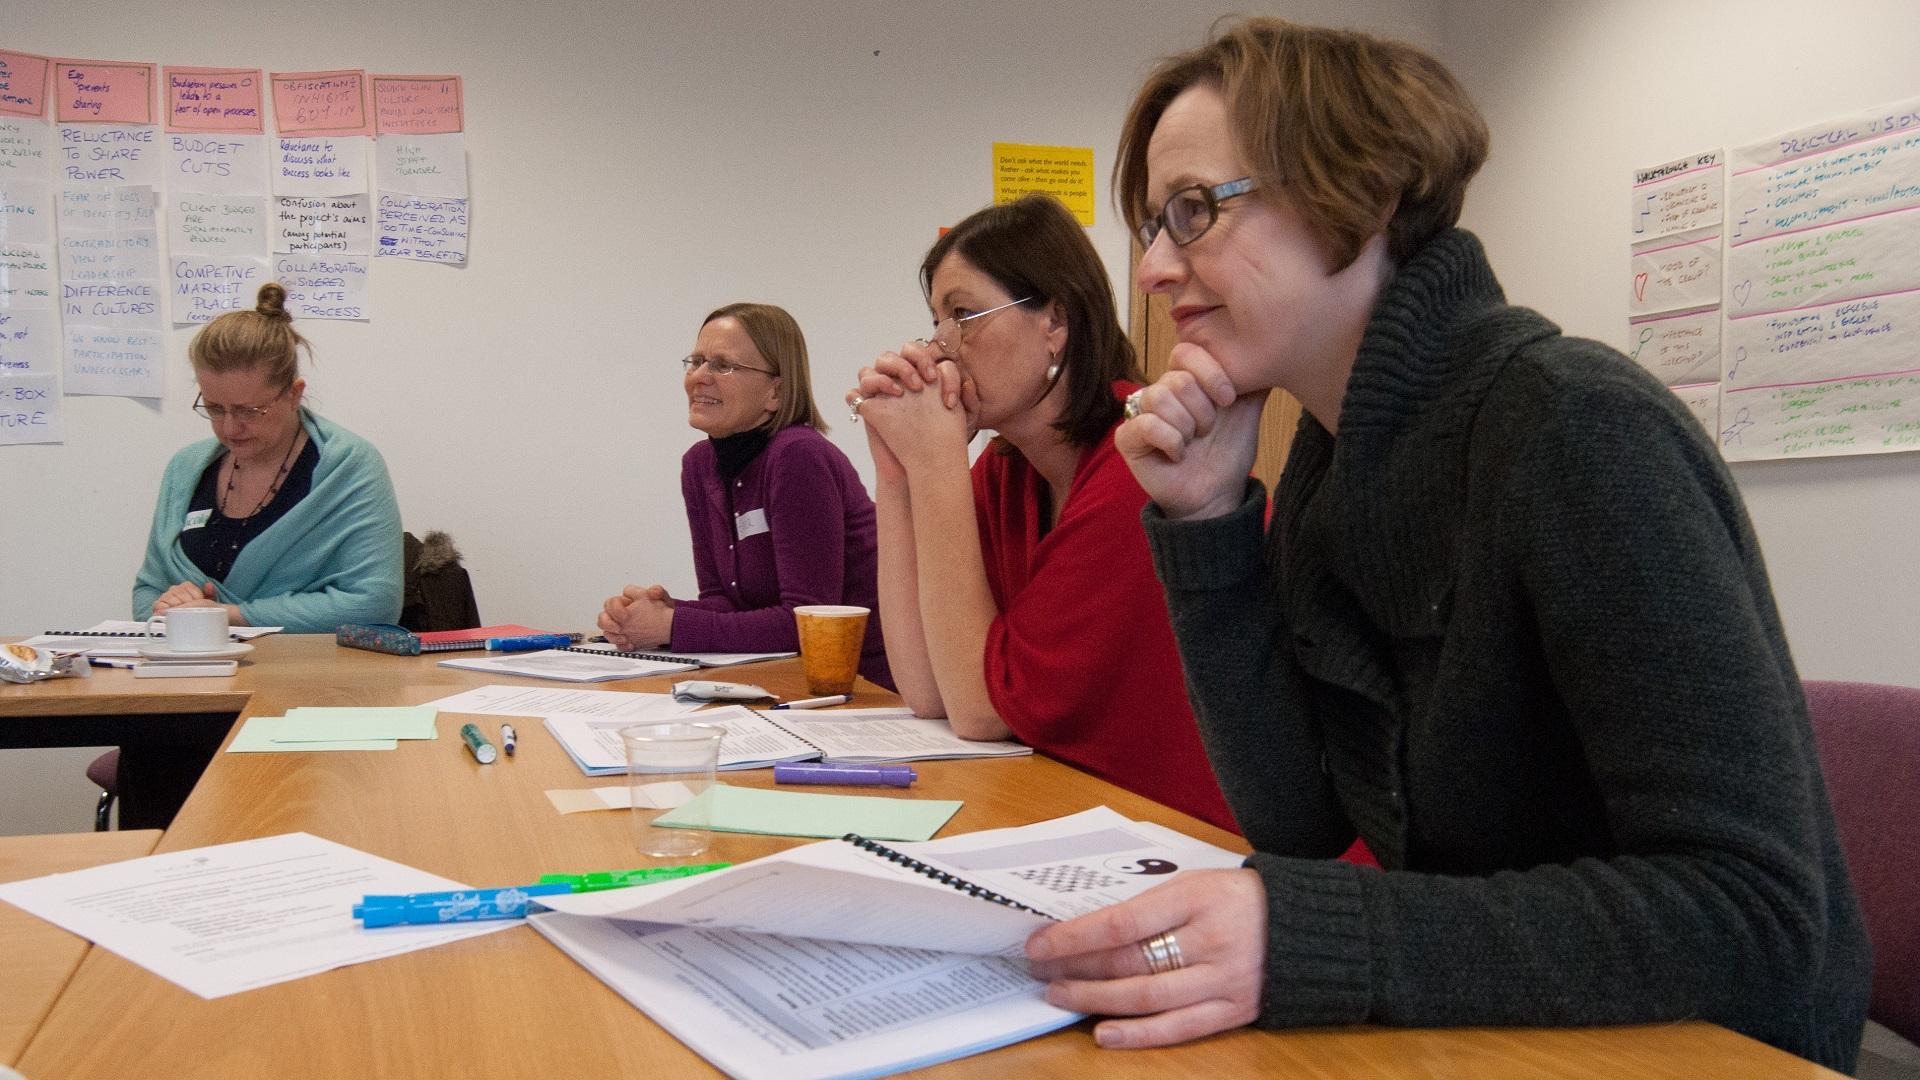 Action Planning – Martin Gilbraith